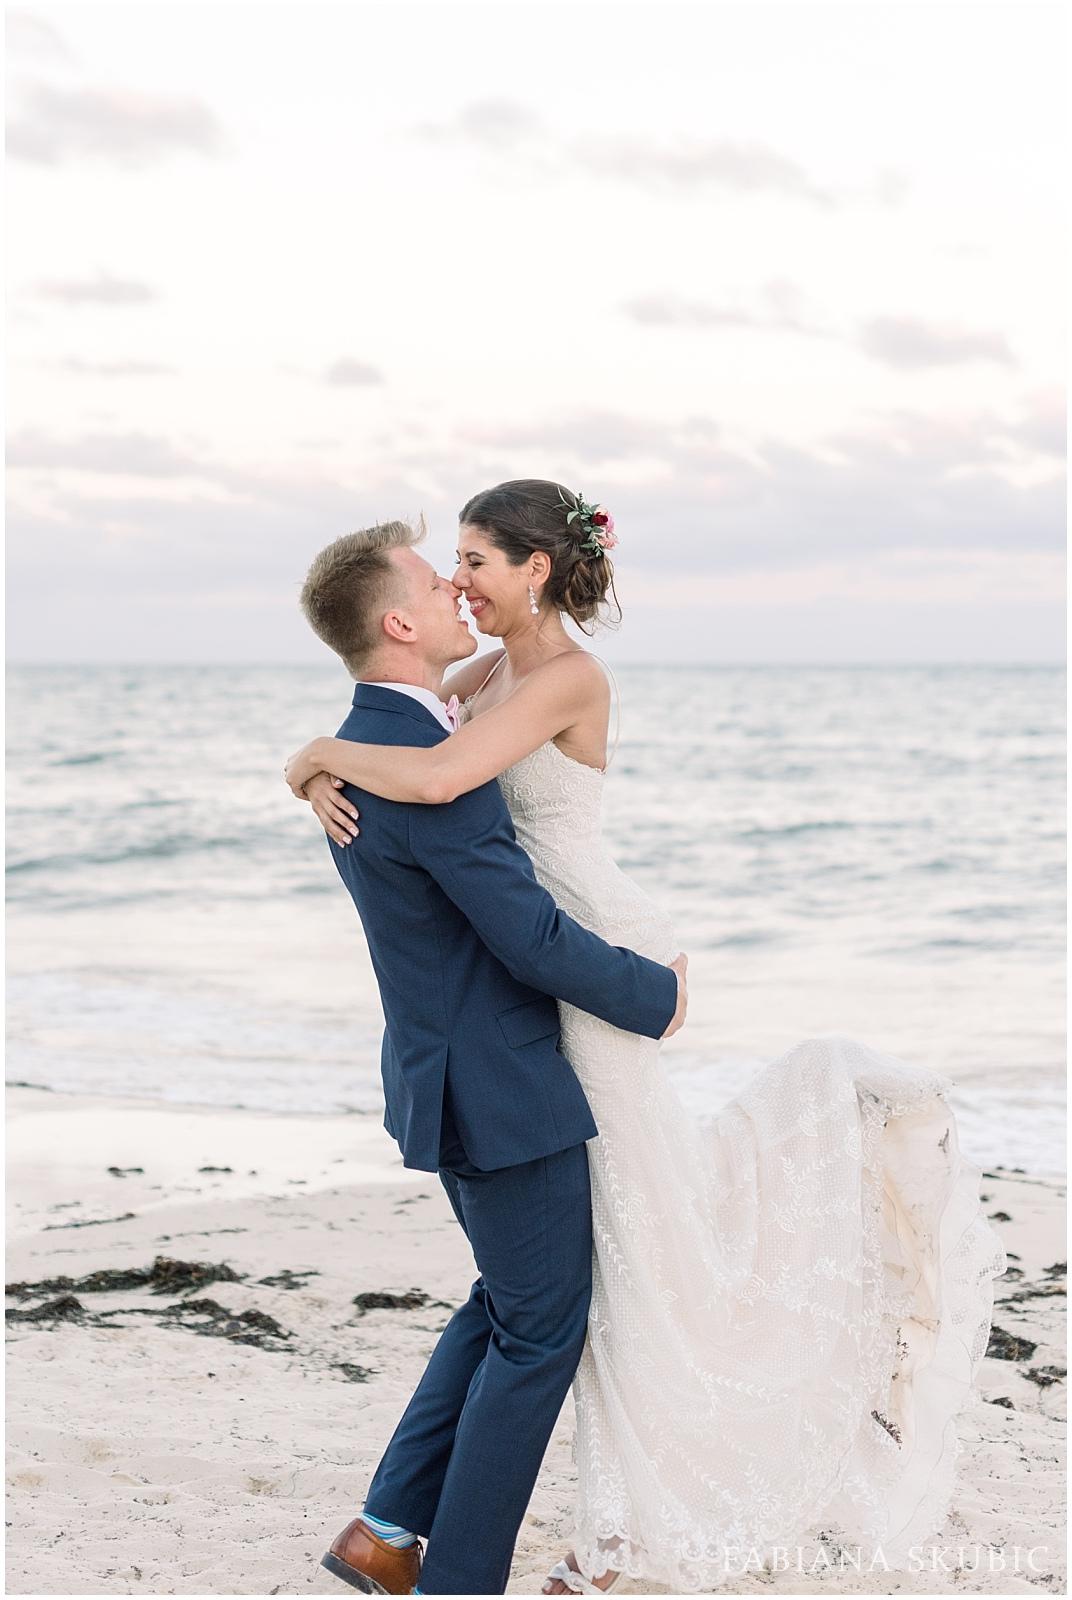 TJ_Now_Sapphire_Riviera_Cancun_Mexico_Wedding_Photos_0277.jpg